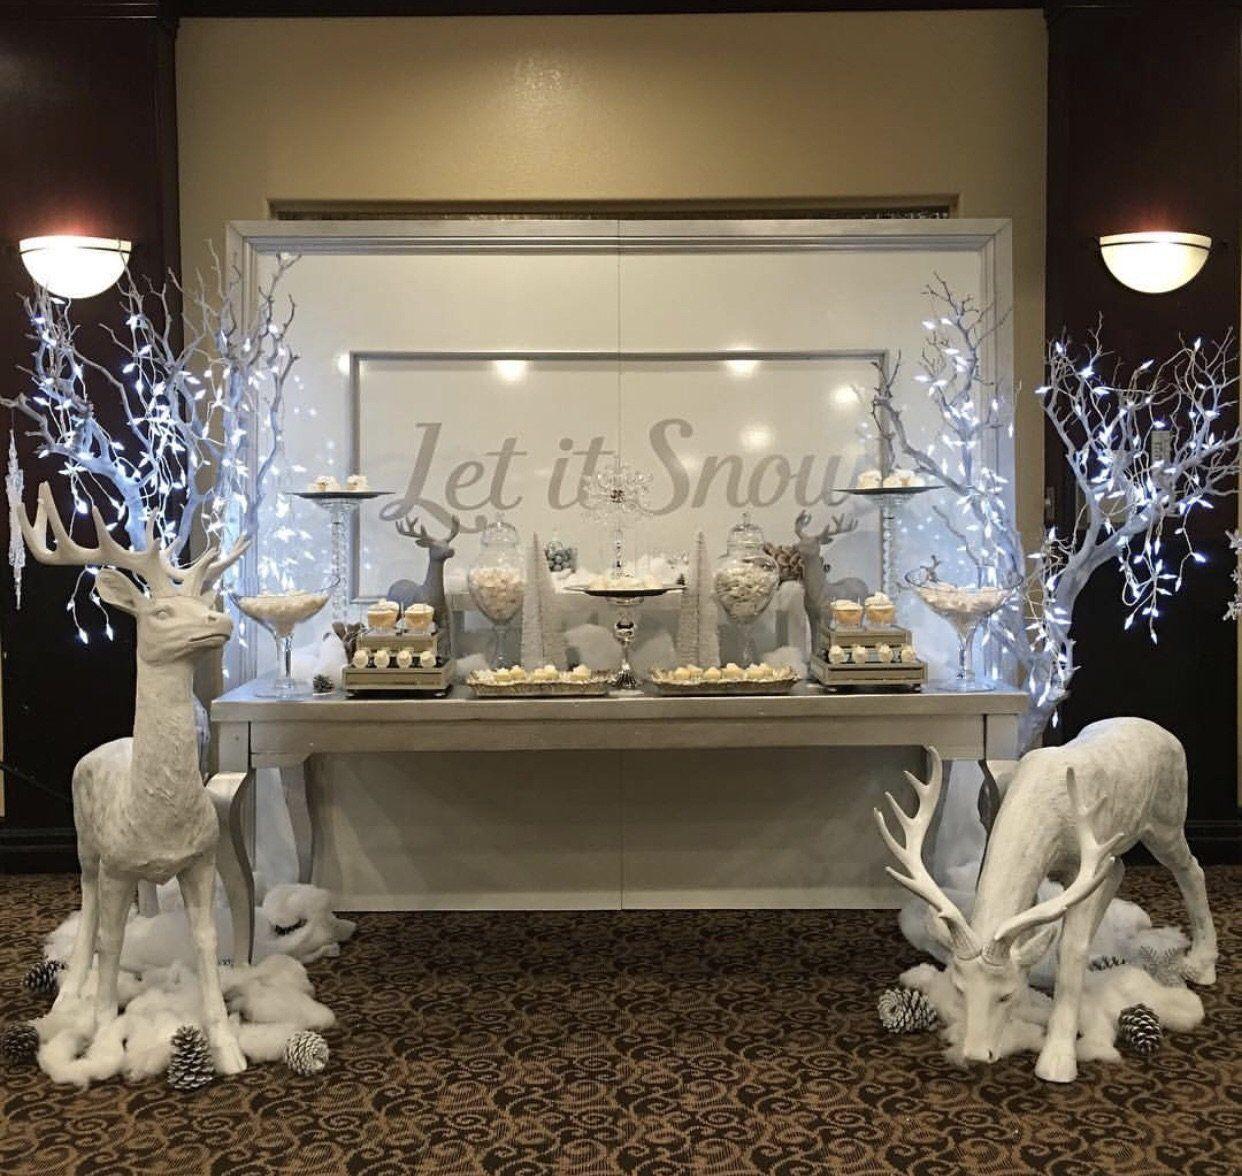 Let It Snow Backdrop Panels Winter Wonderland Christmas Party White Party Decorations Winter Wonderland Decorations